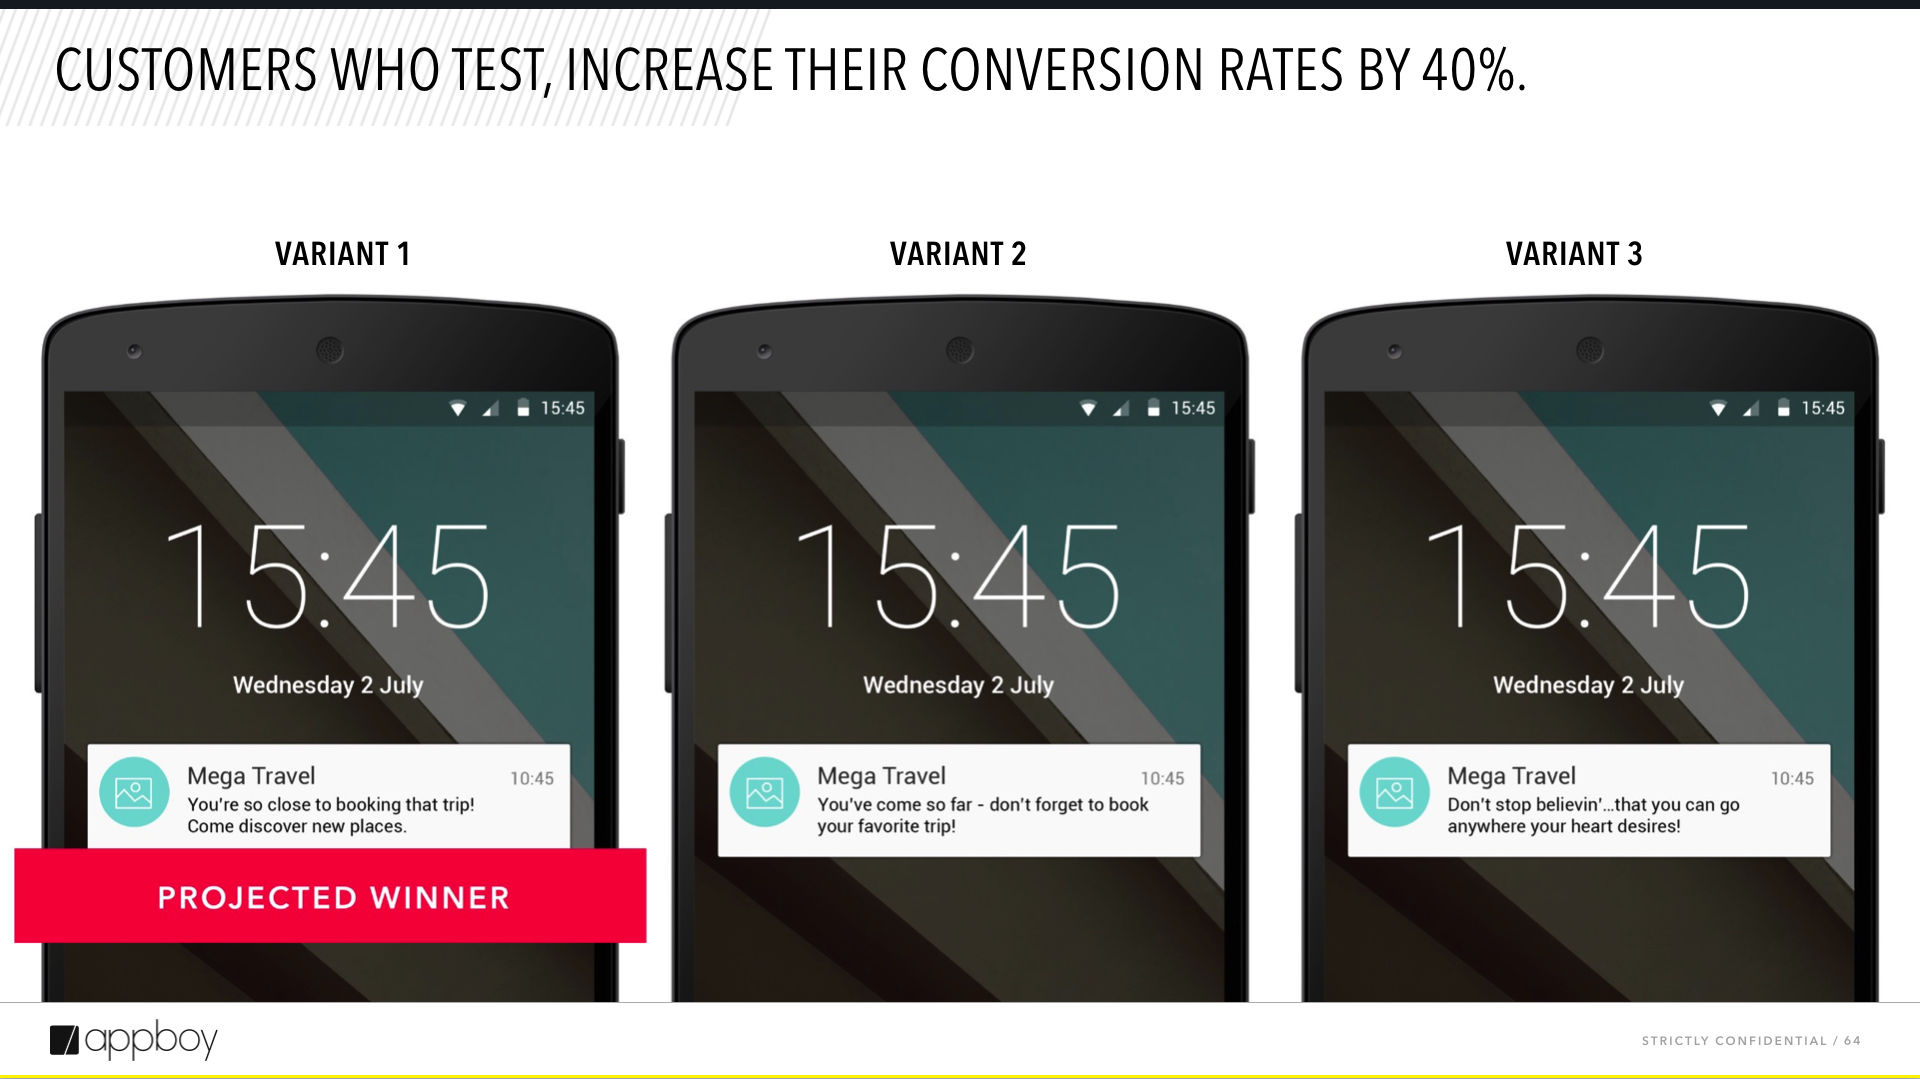 multivariate testing increases conversion